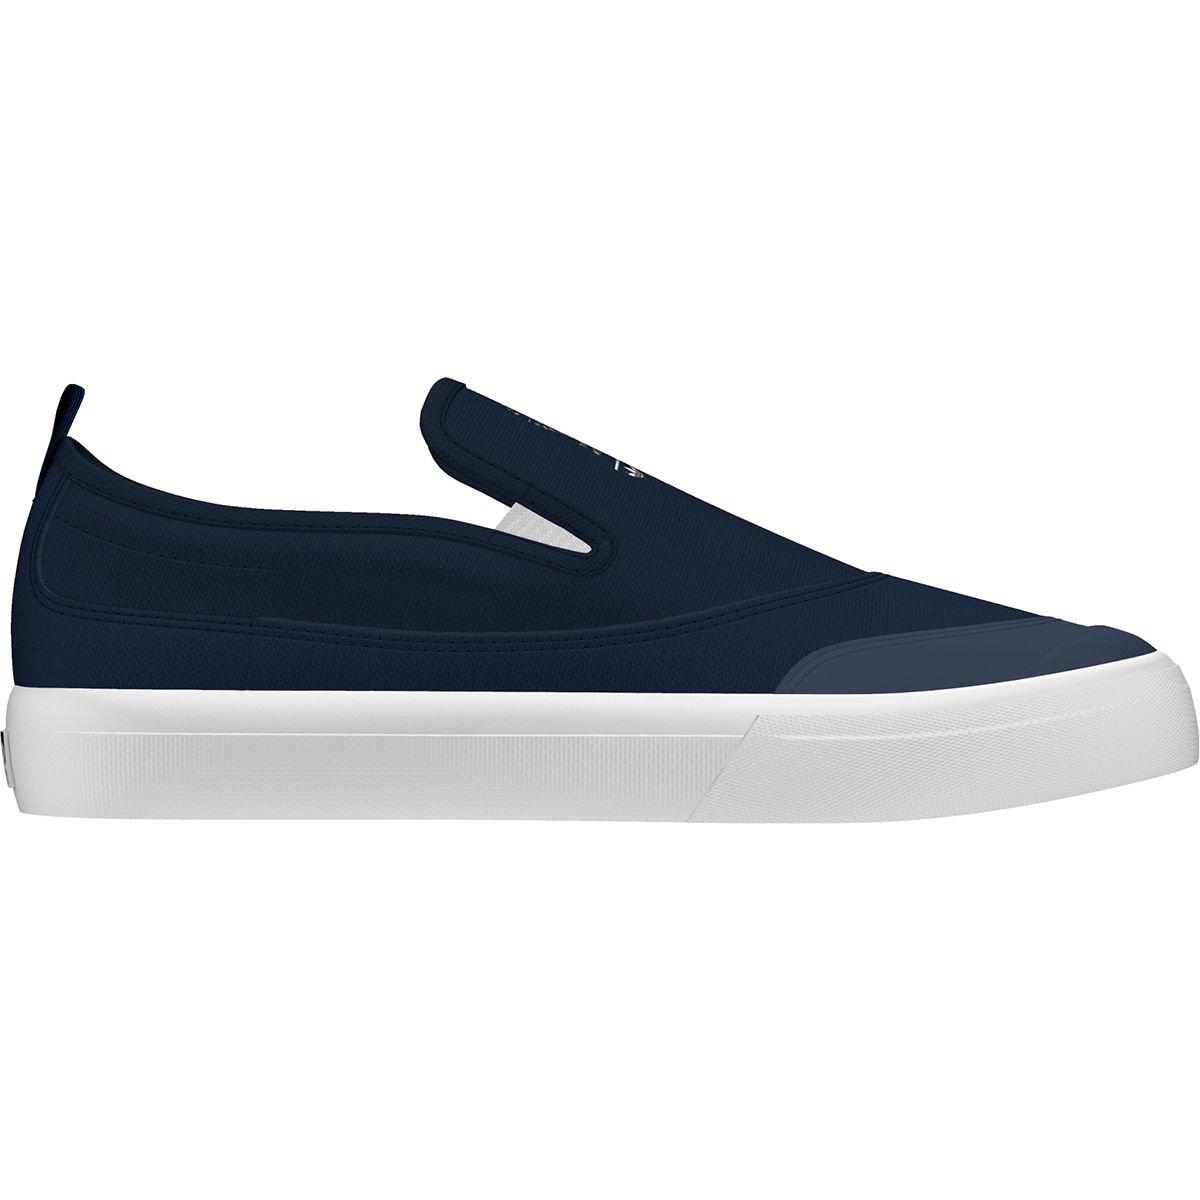 low cost 8445f eefb1 adidas Matchcourt Slip on Sneaker 11 11 11 D(M) US B075ZYBXYK 8fa60a